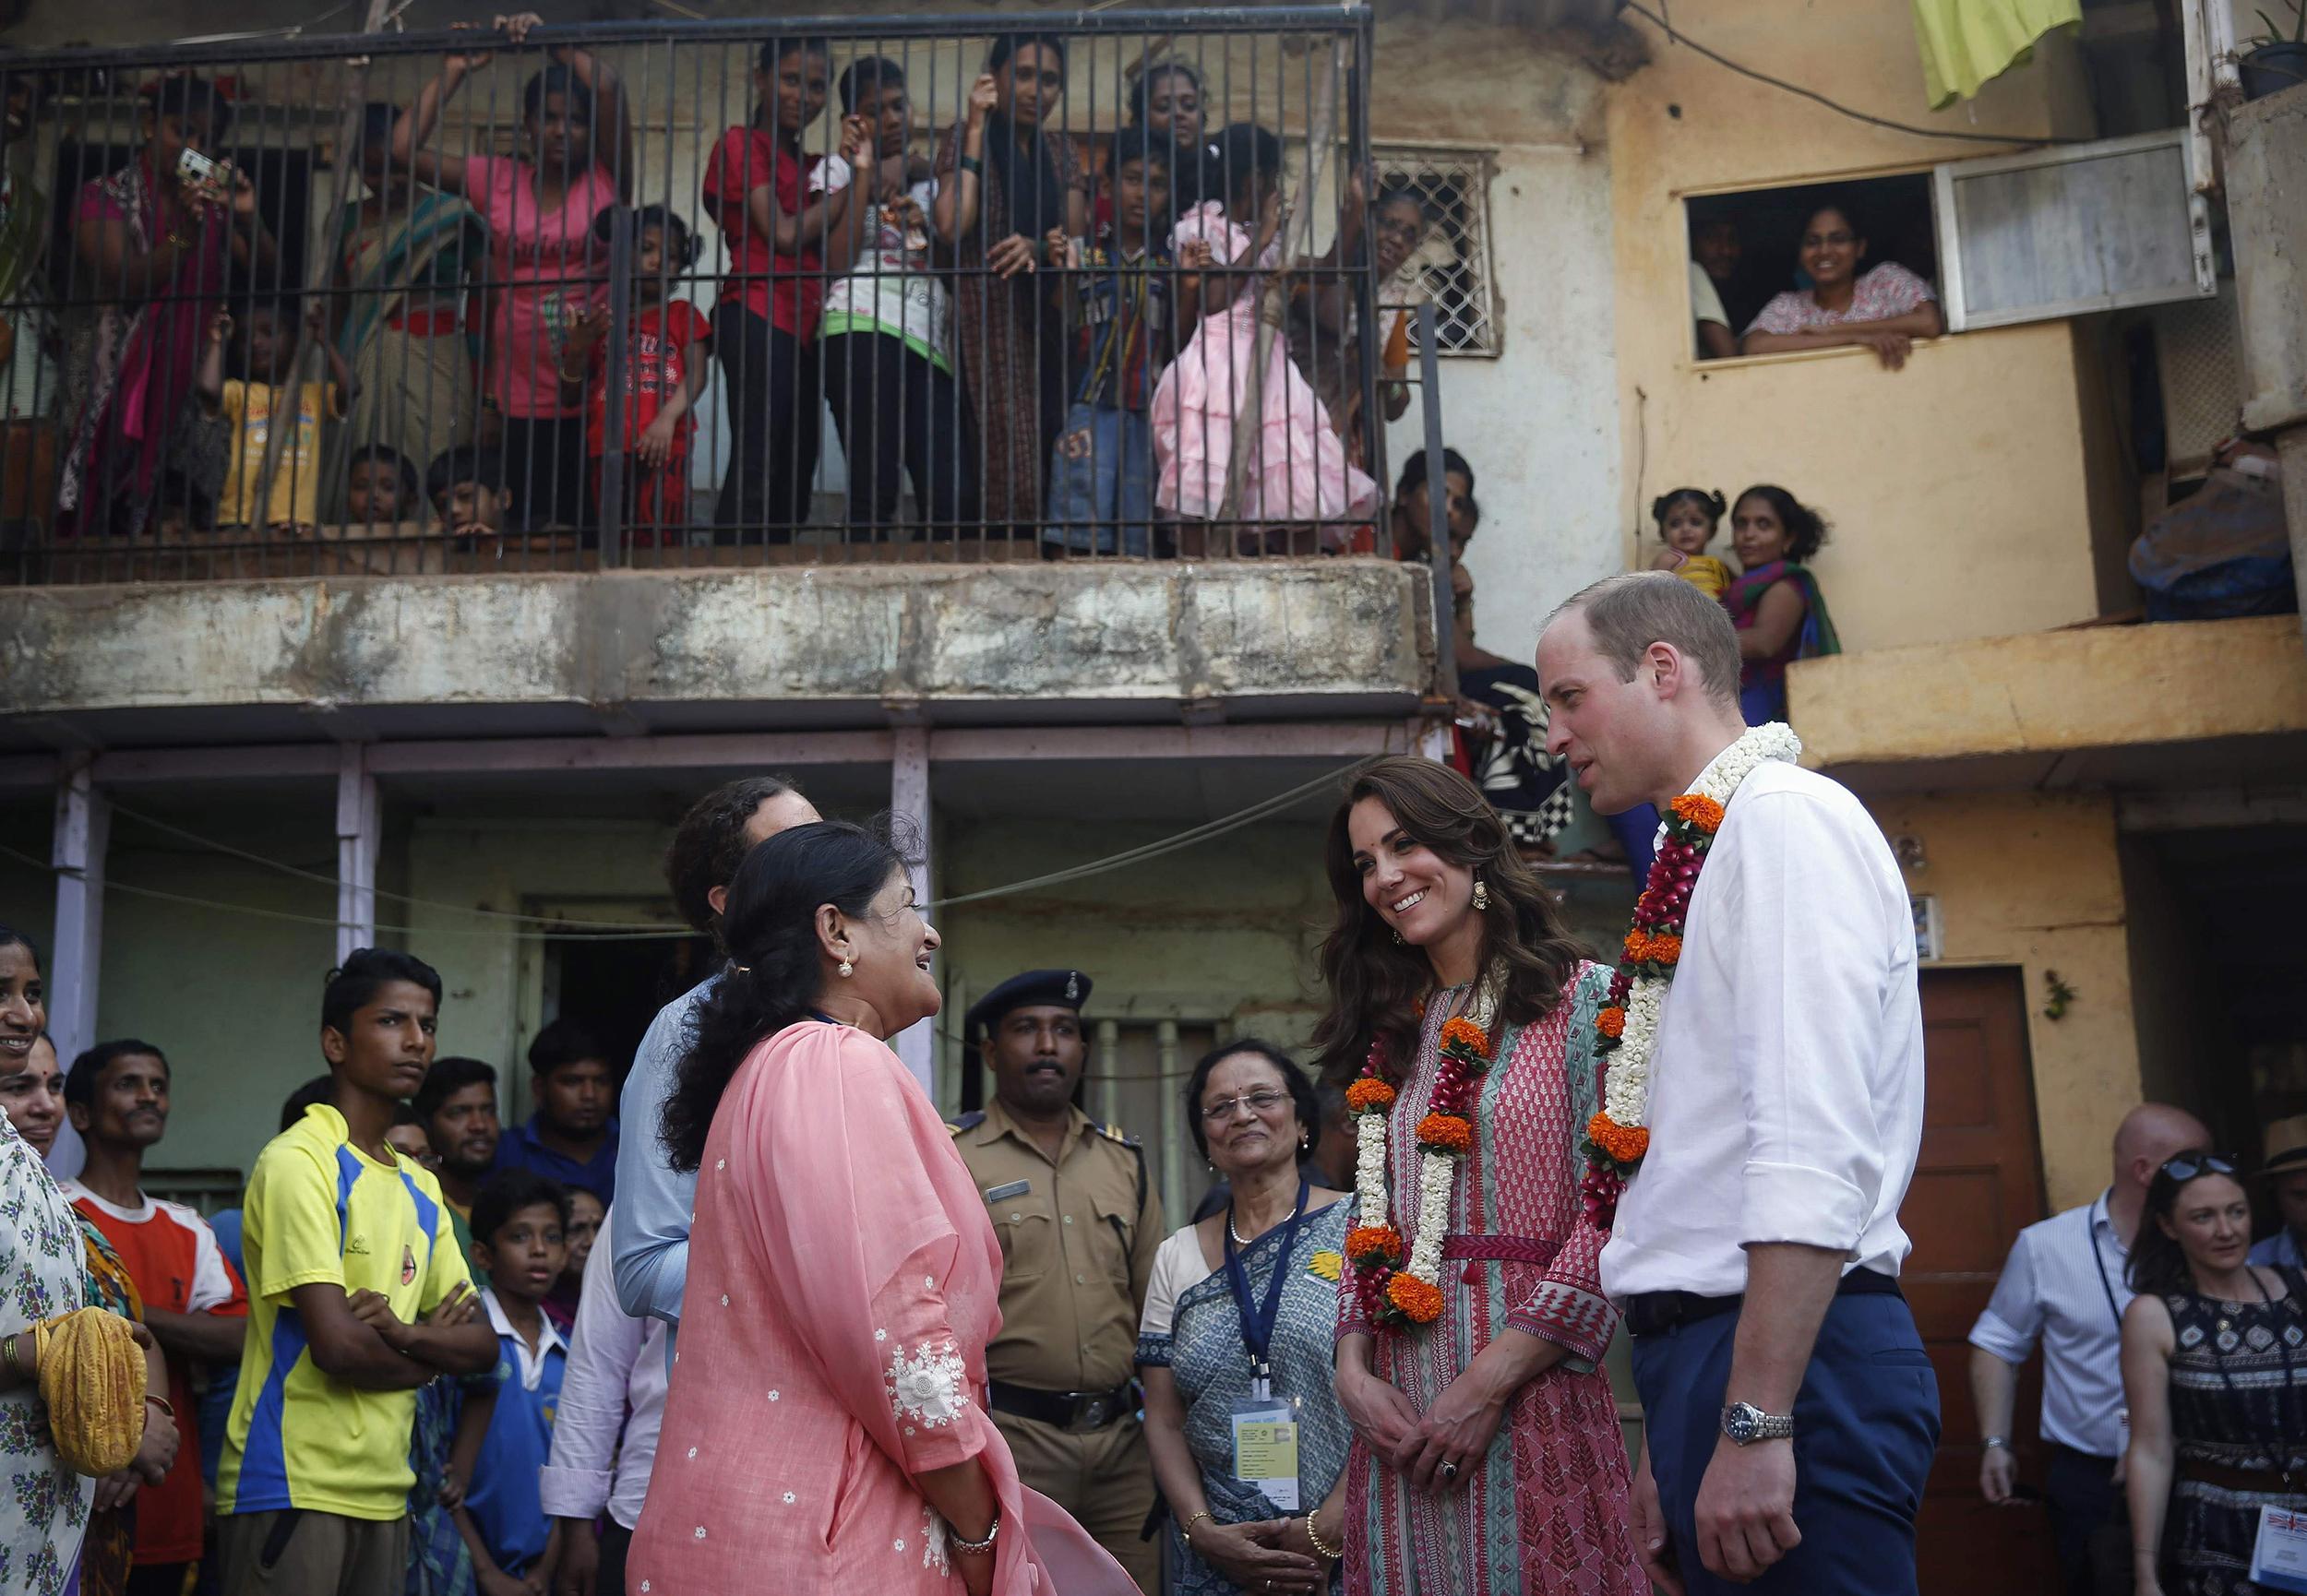 Prince William and Catherine, the Duchess of Cambridge, visit a slum area of Mumbai, India on April 10, 2016.